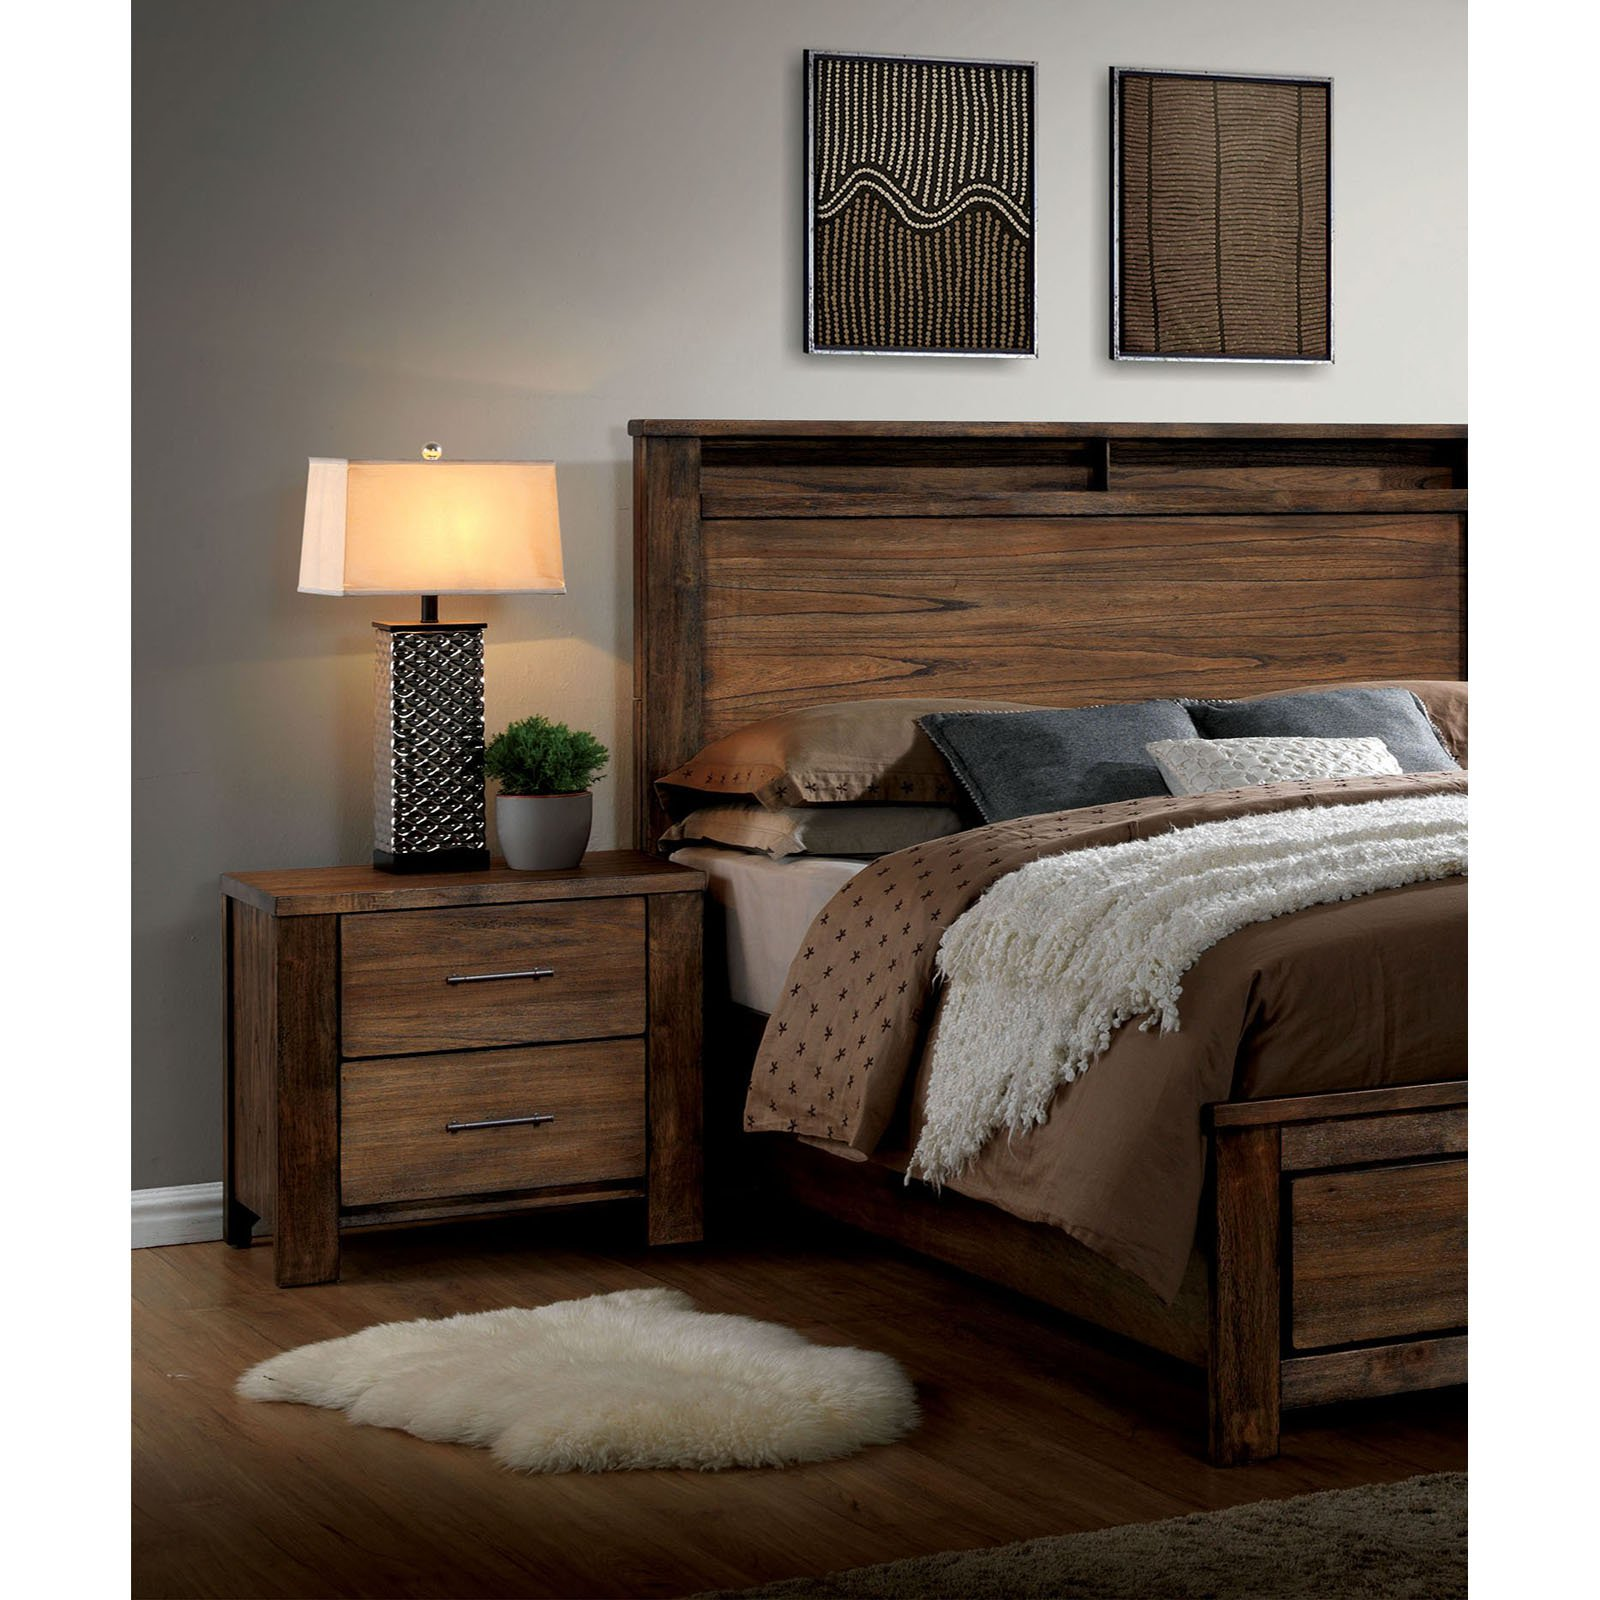 Furniture of America Orlando 2 Drawer Nightstand